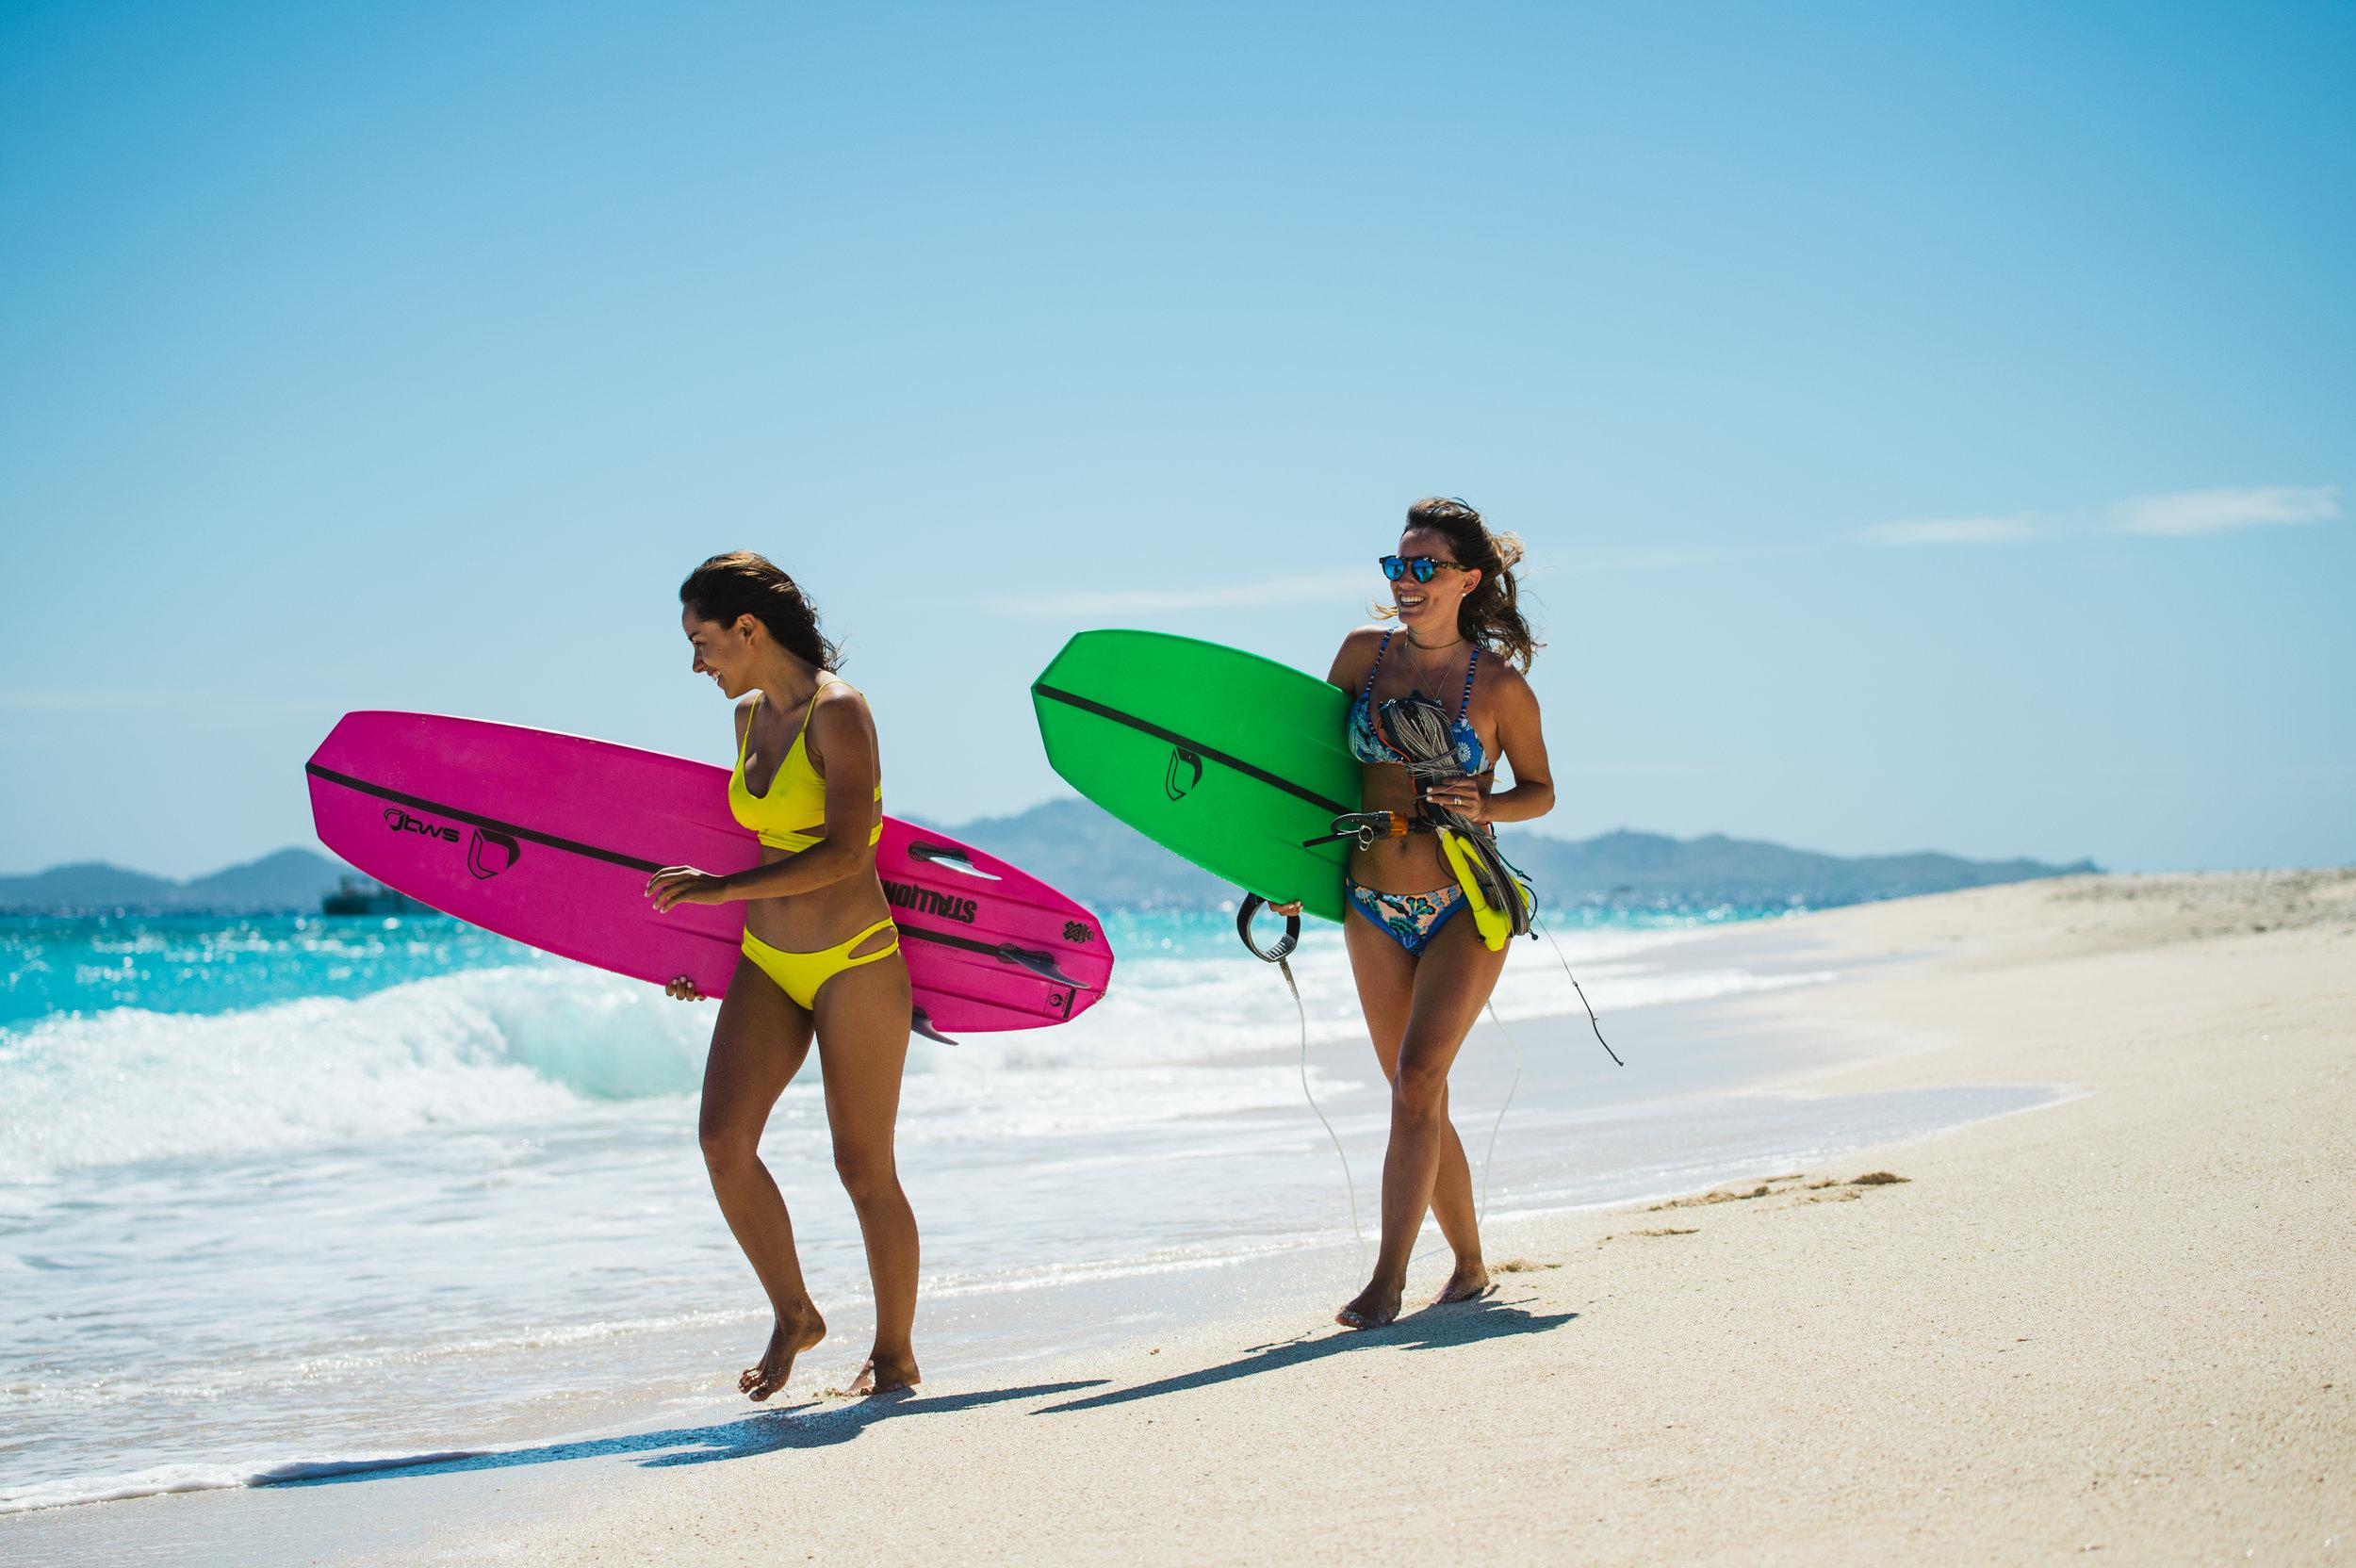 BWSURF Kiteboards - Tough & innovative construction. Unbeatable surf performance.